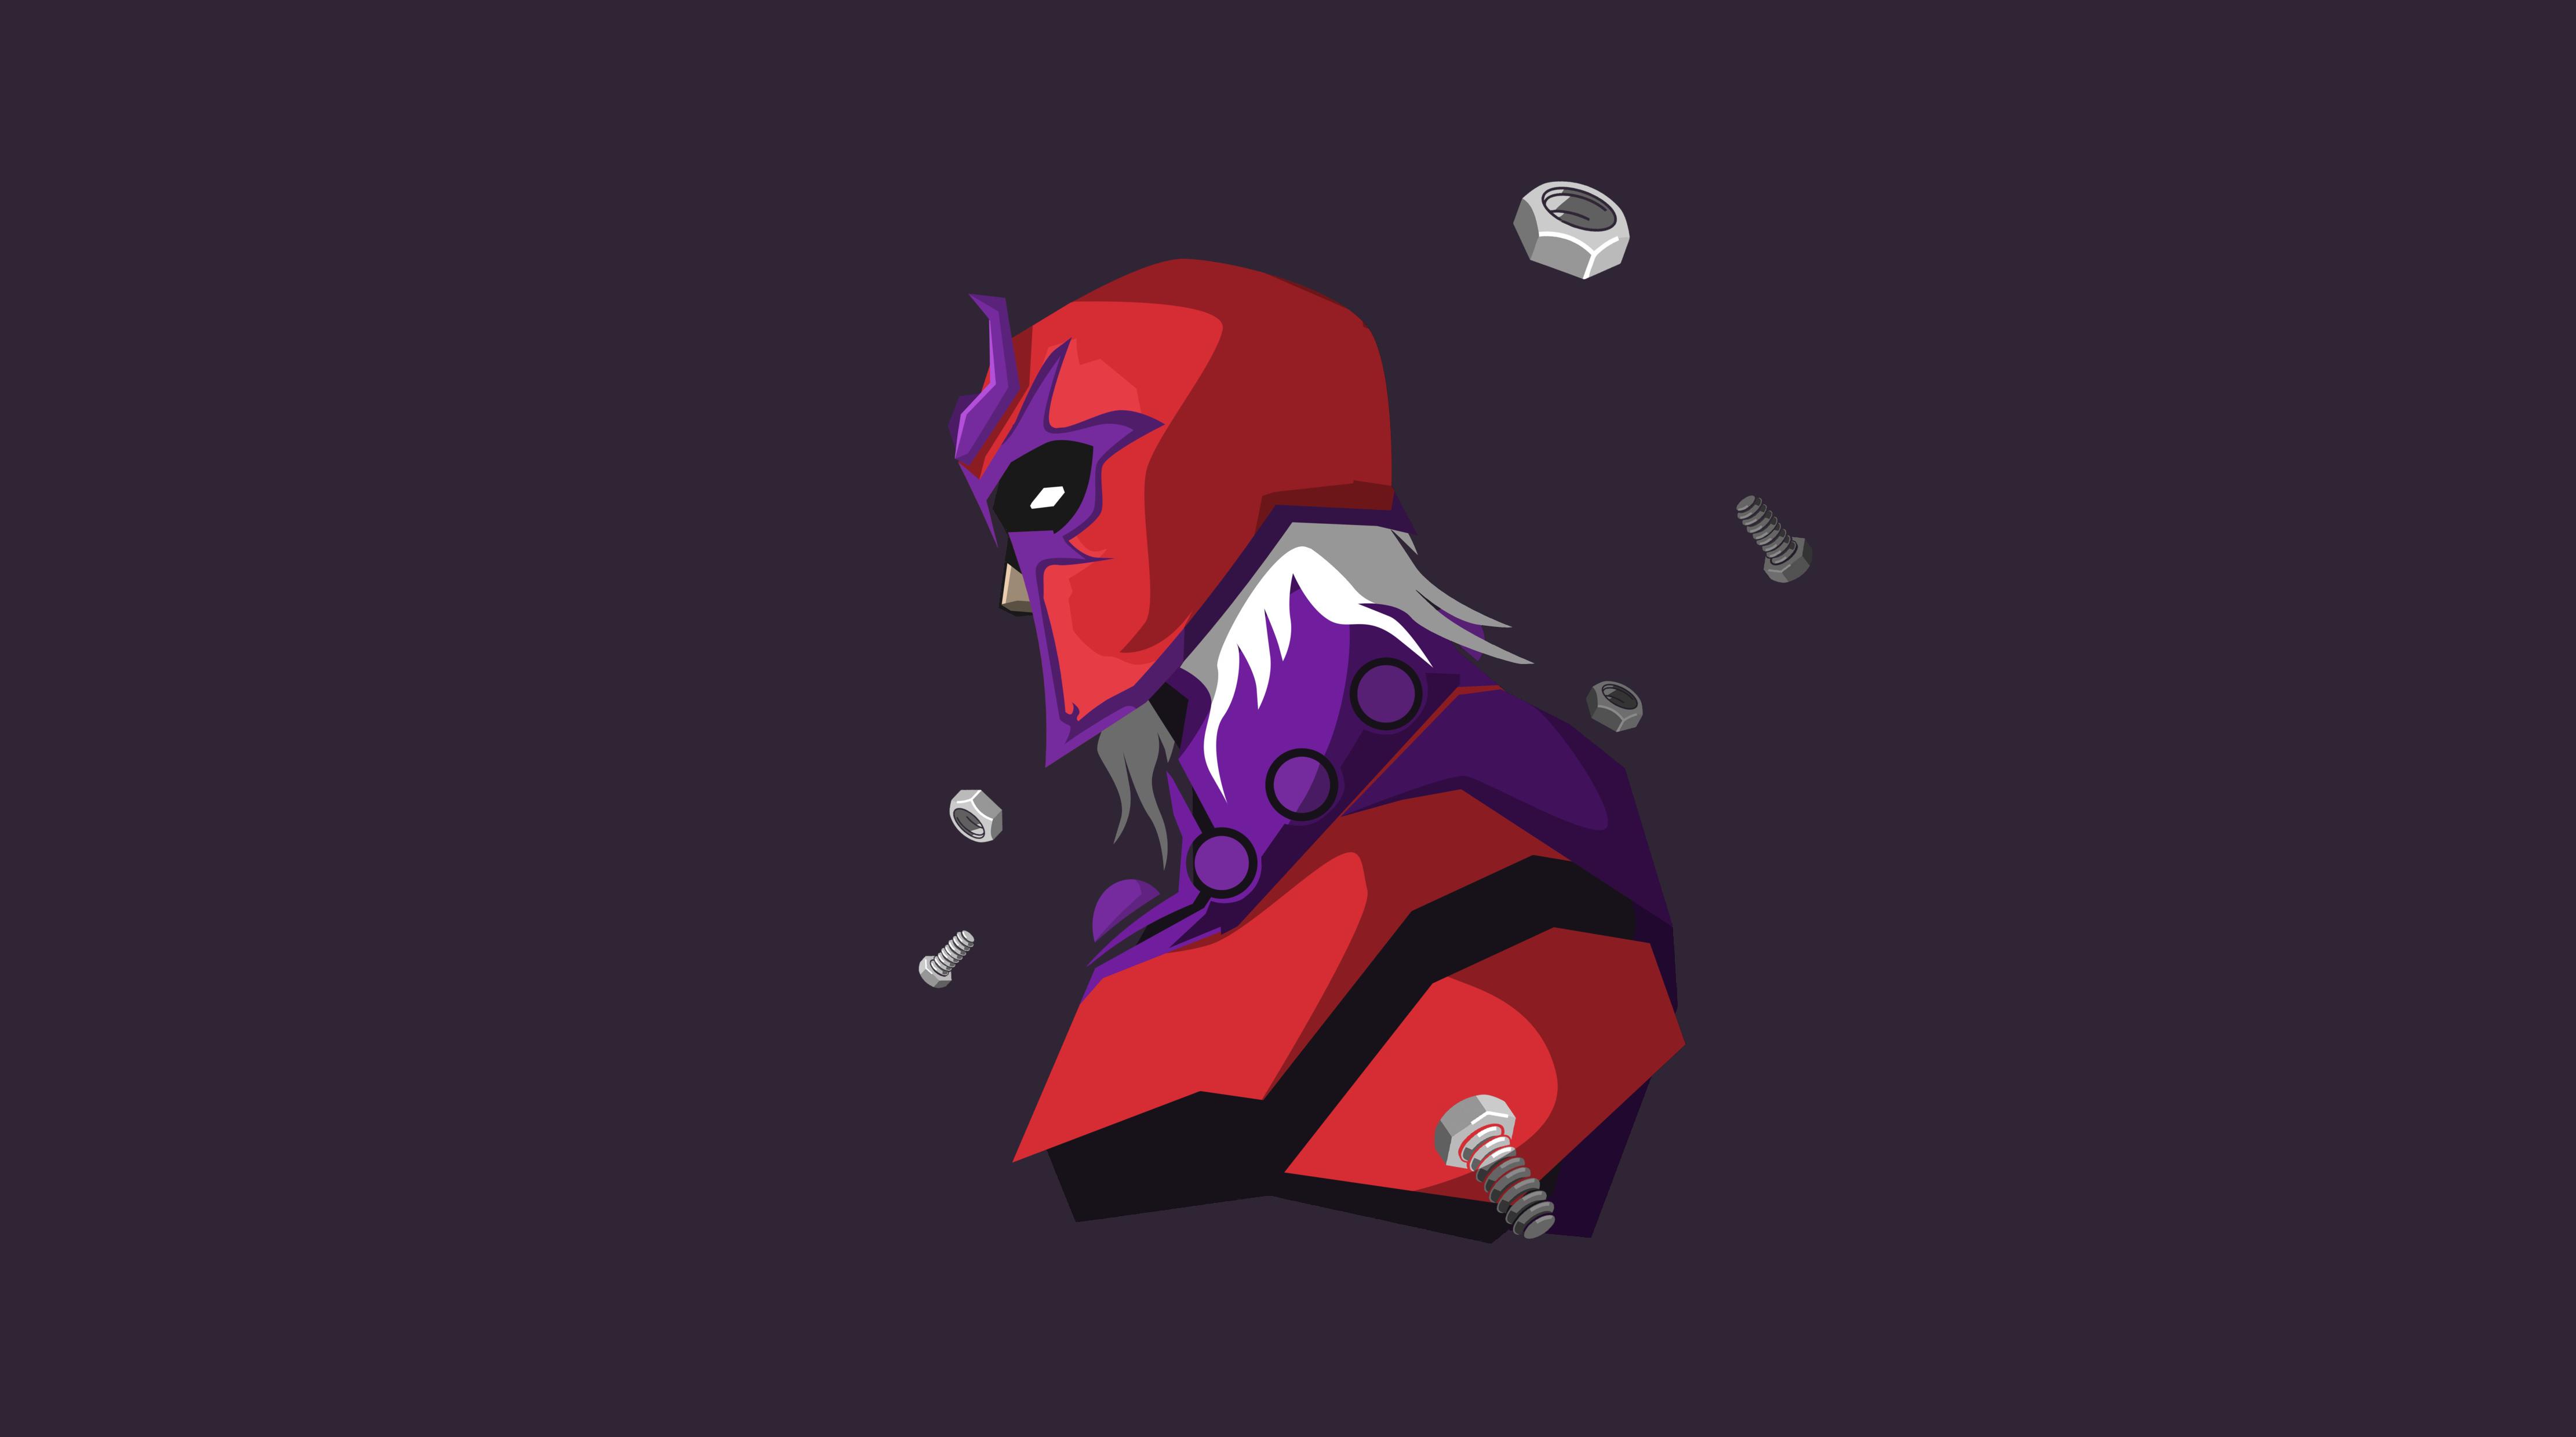 Magneto comics 4k Ultra HD Wallpaper Background Image 4445x2480 4445x2480